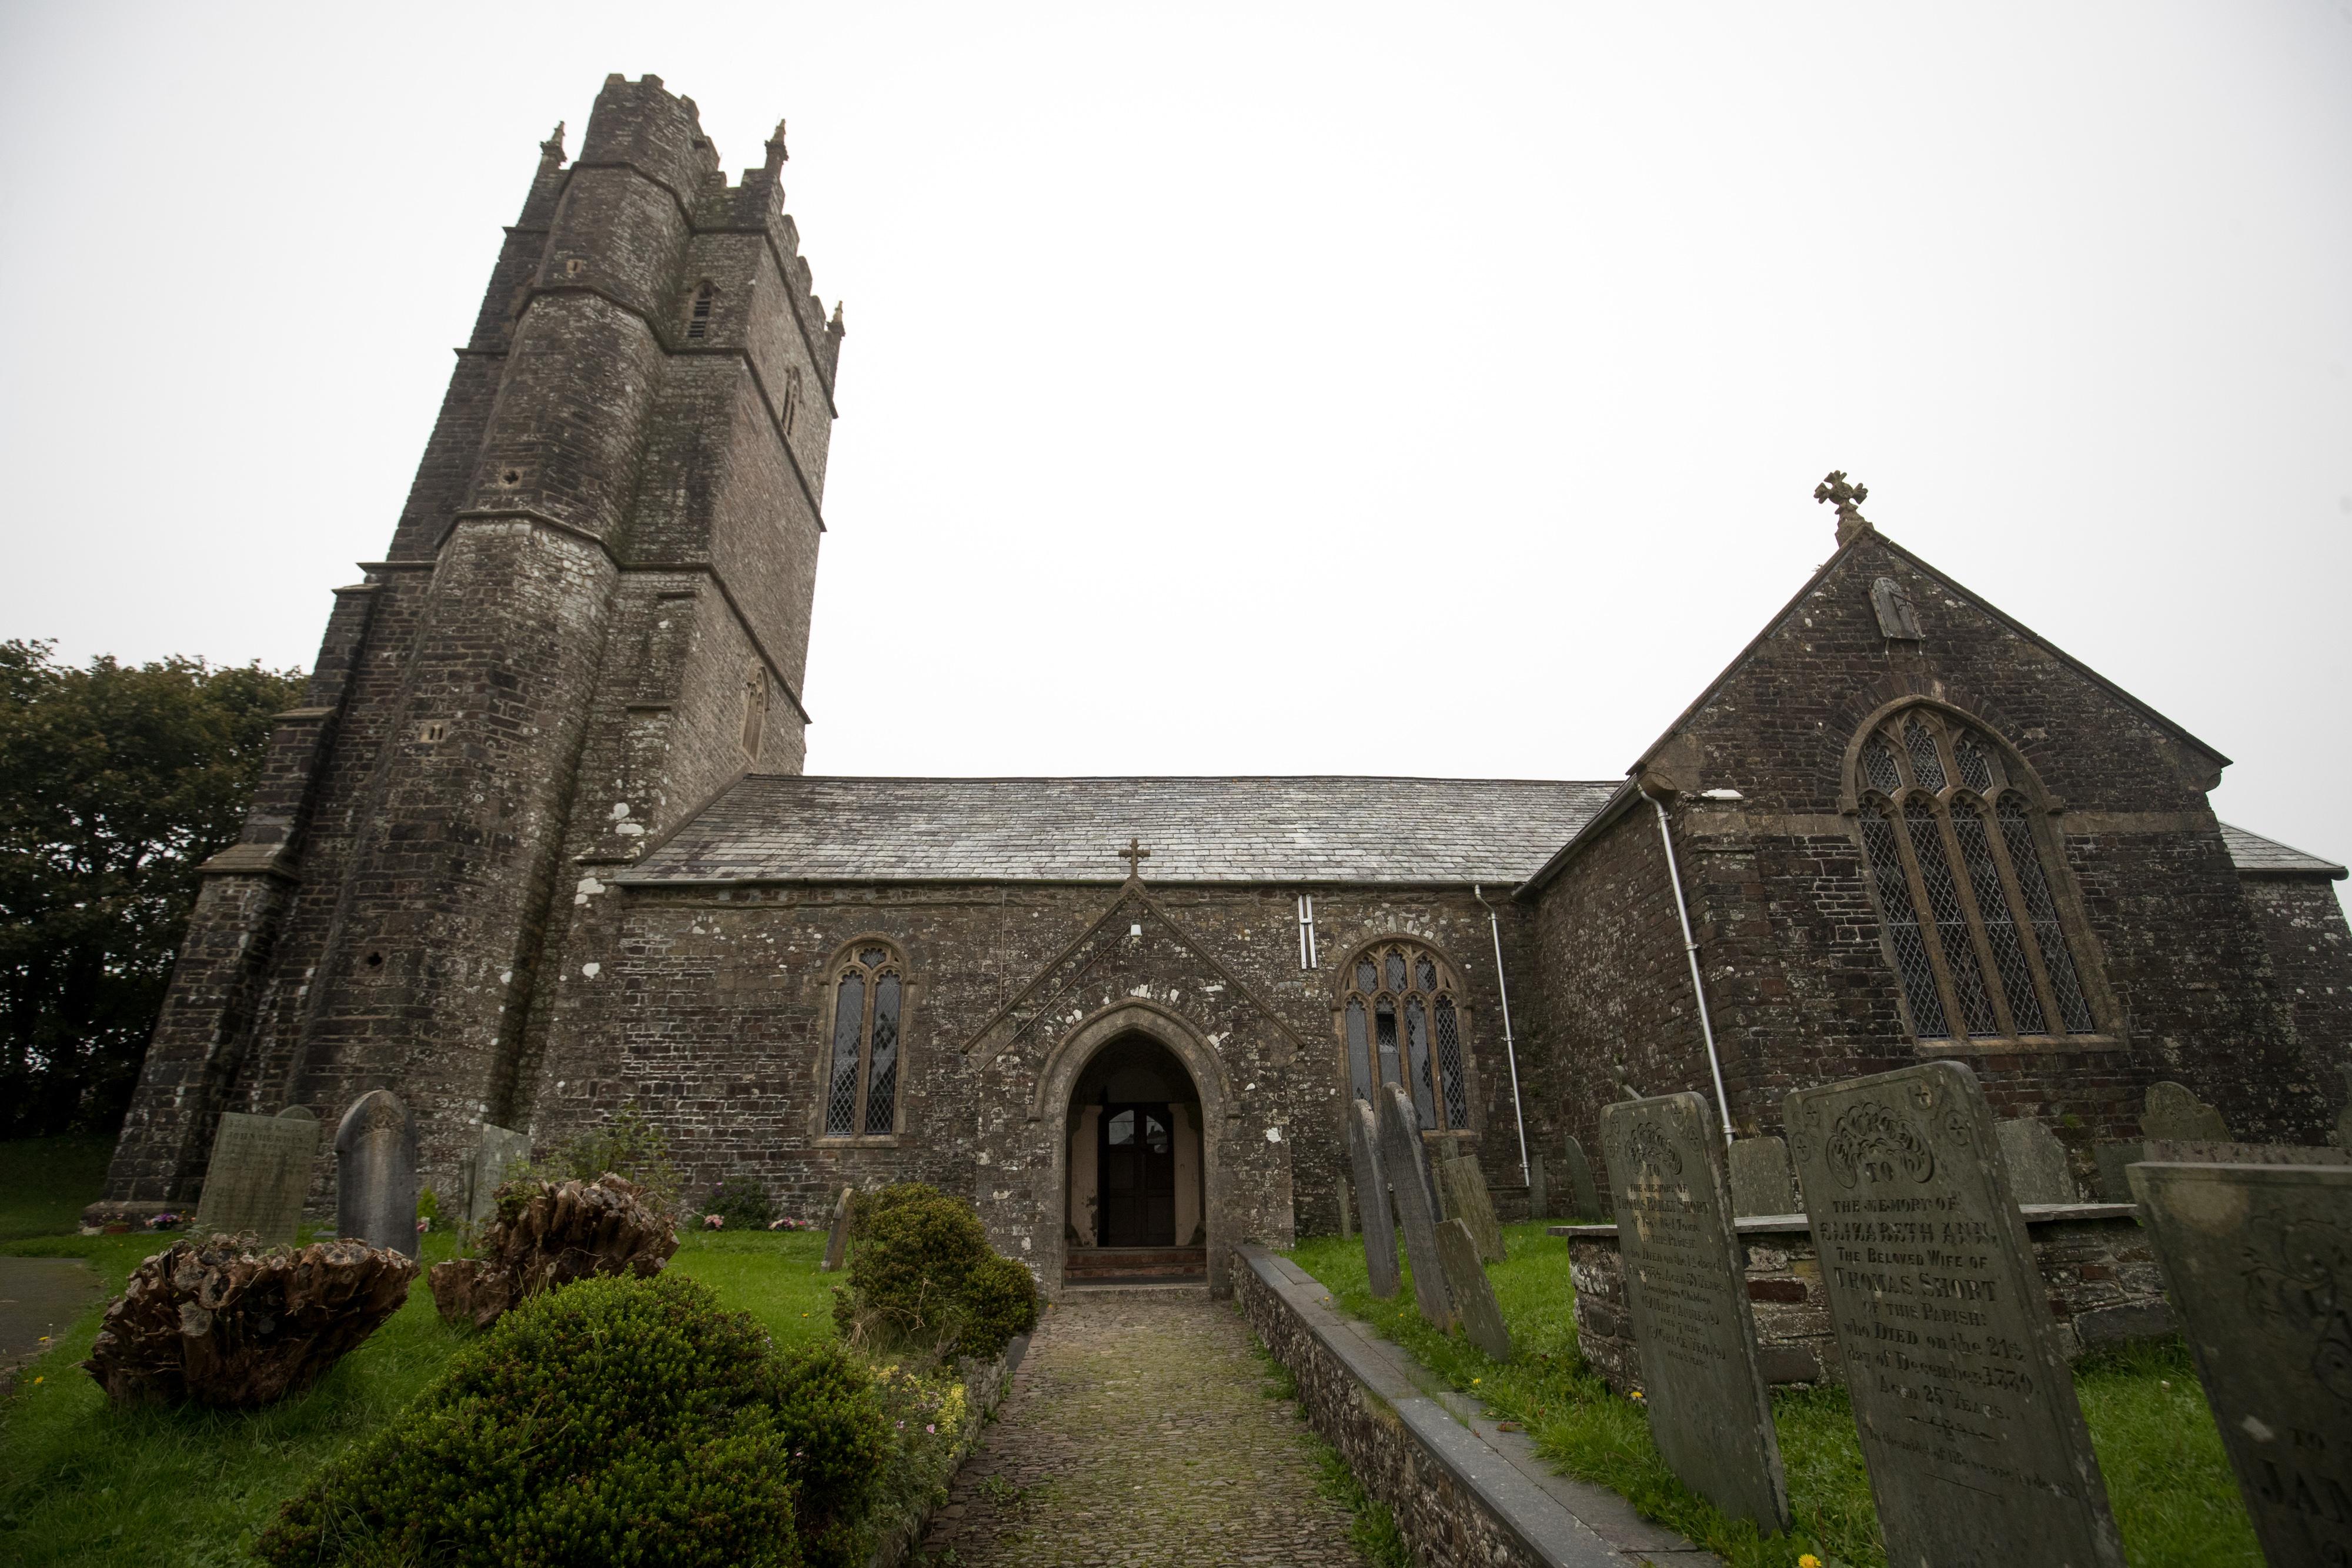 Bebo Founder Invests Millions In Devon Village Of Woolsery